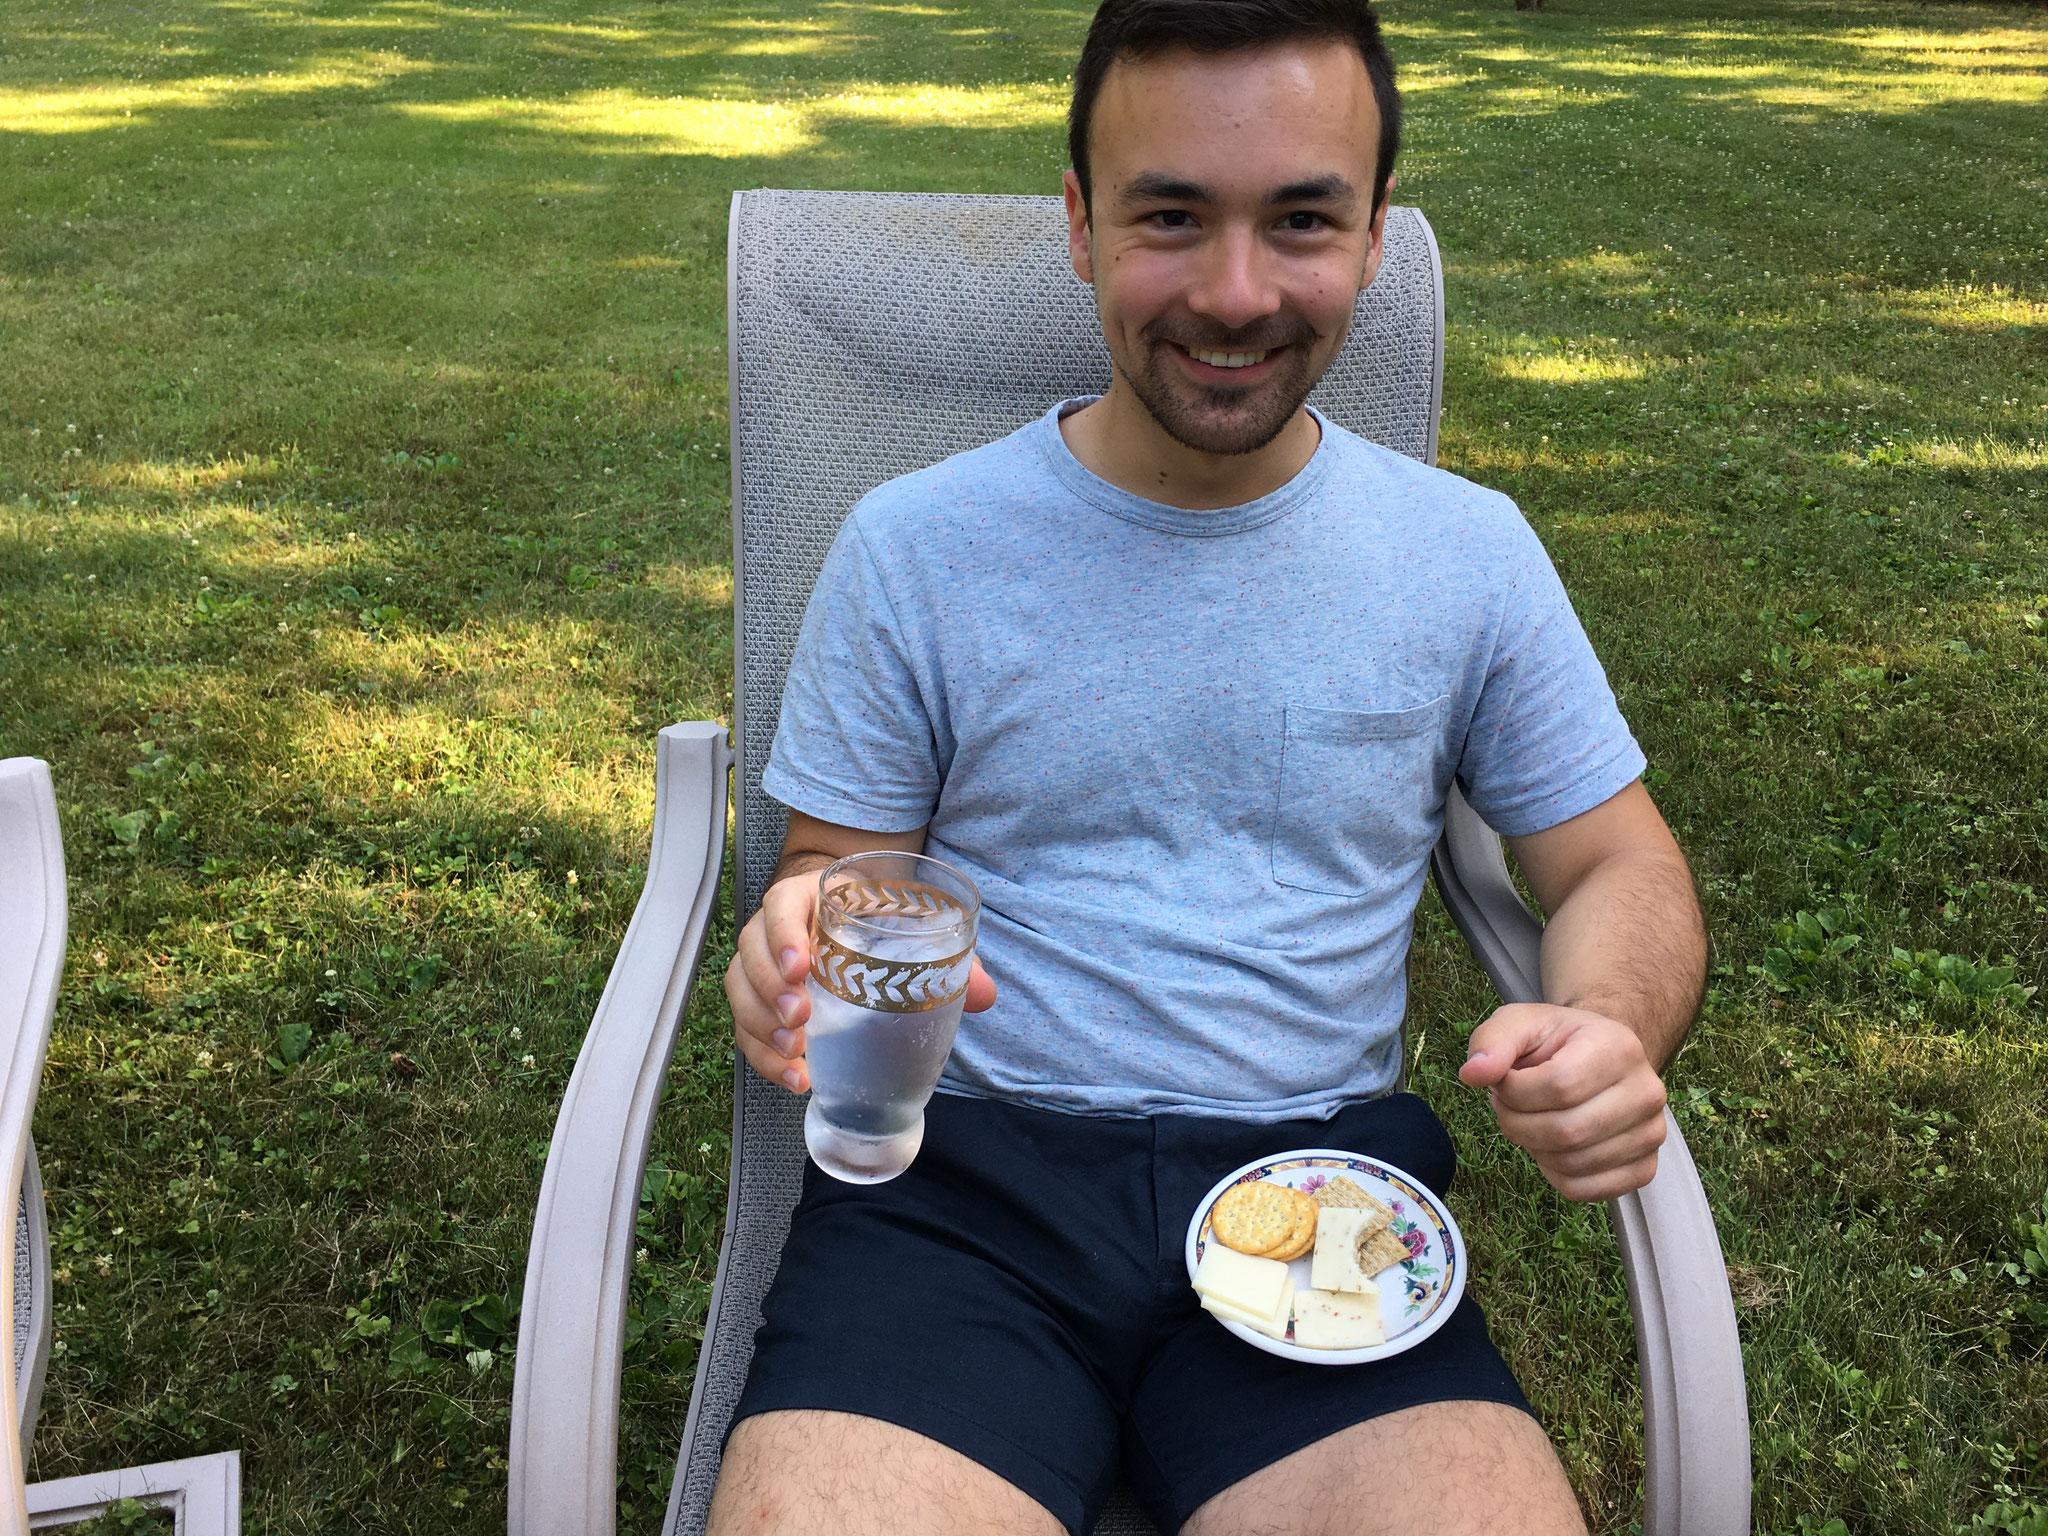 Trevan enjoying his Gin and Titonic drink